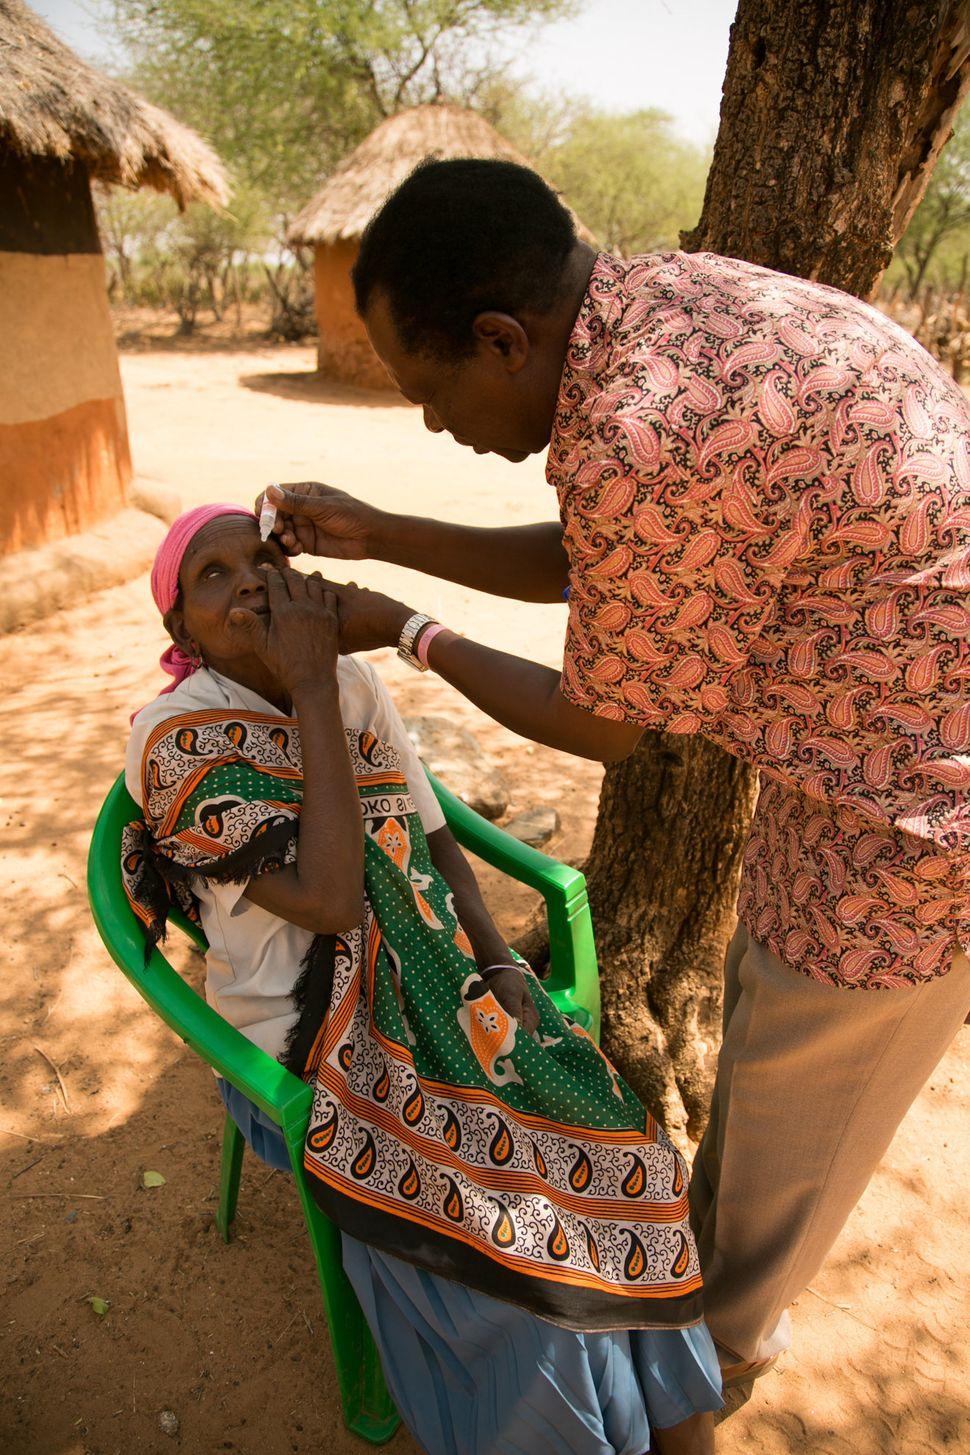 Dr. Michael Makari applies eyedrops to Chepserum'seyes during a follow-up visit. Makari has performed basic surge